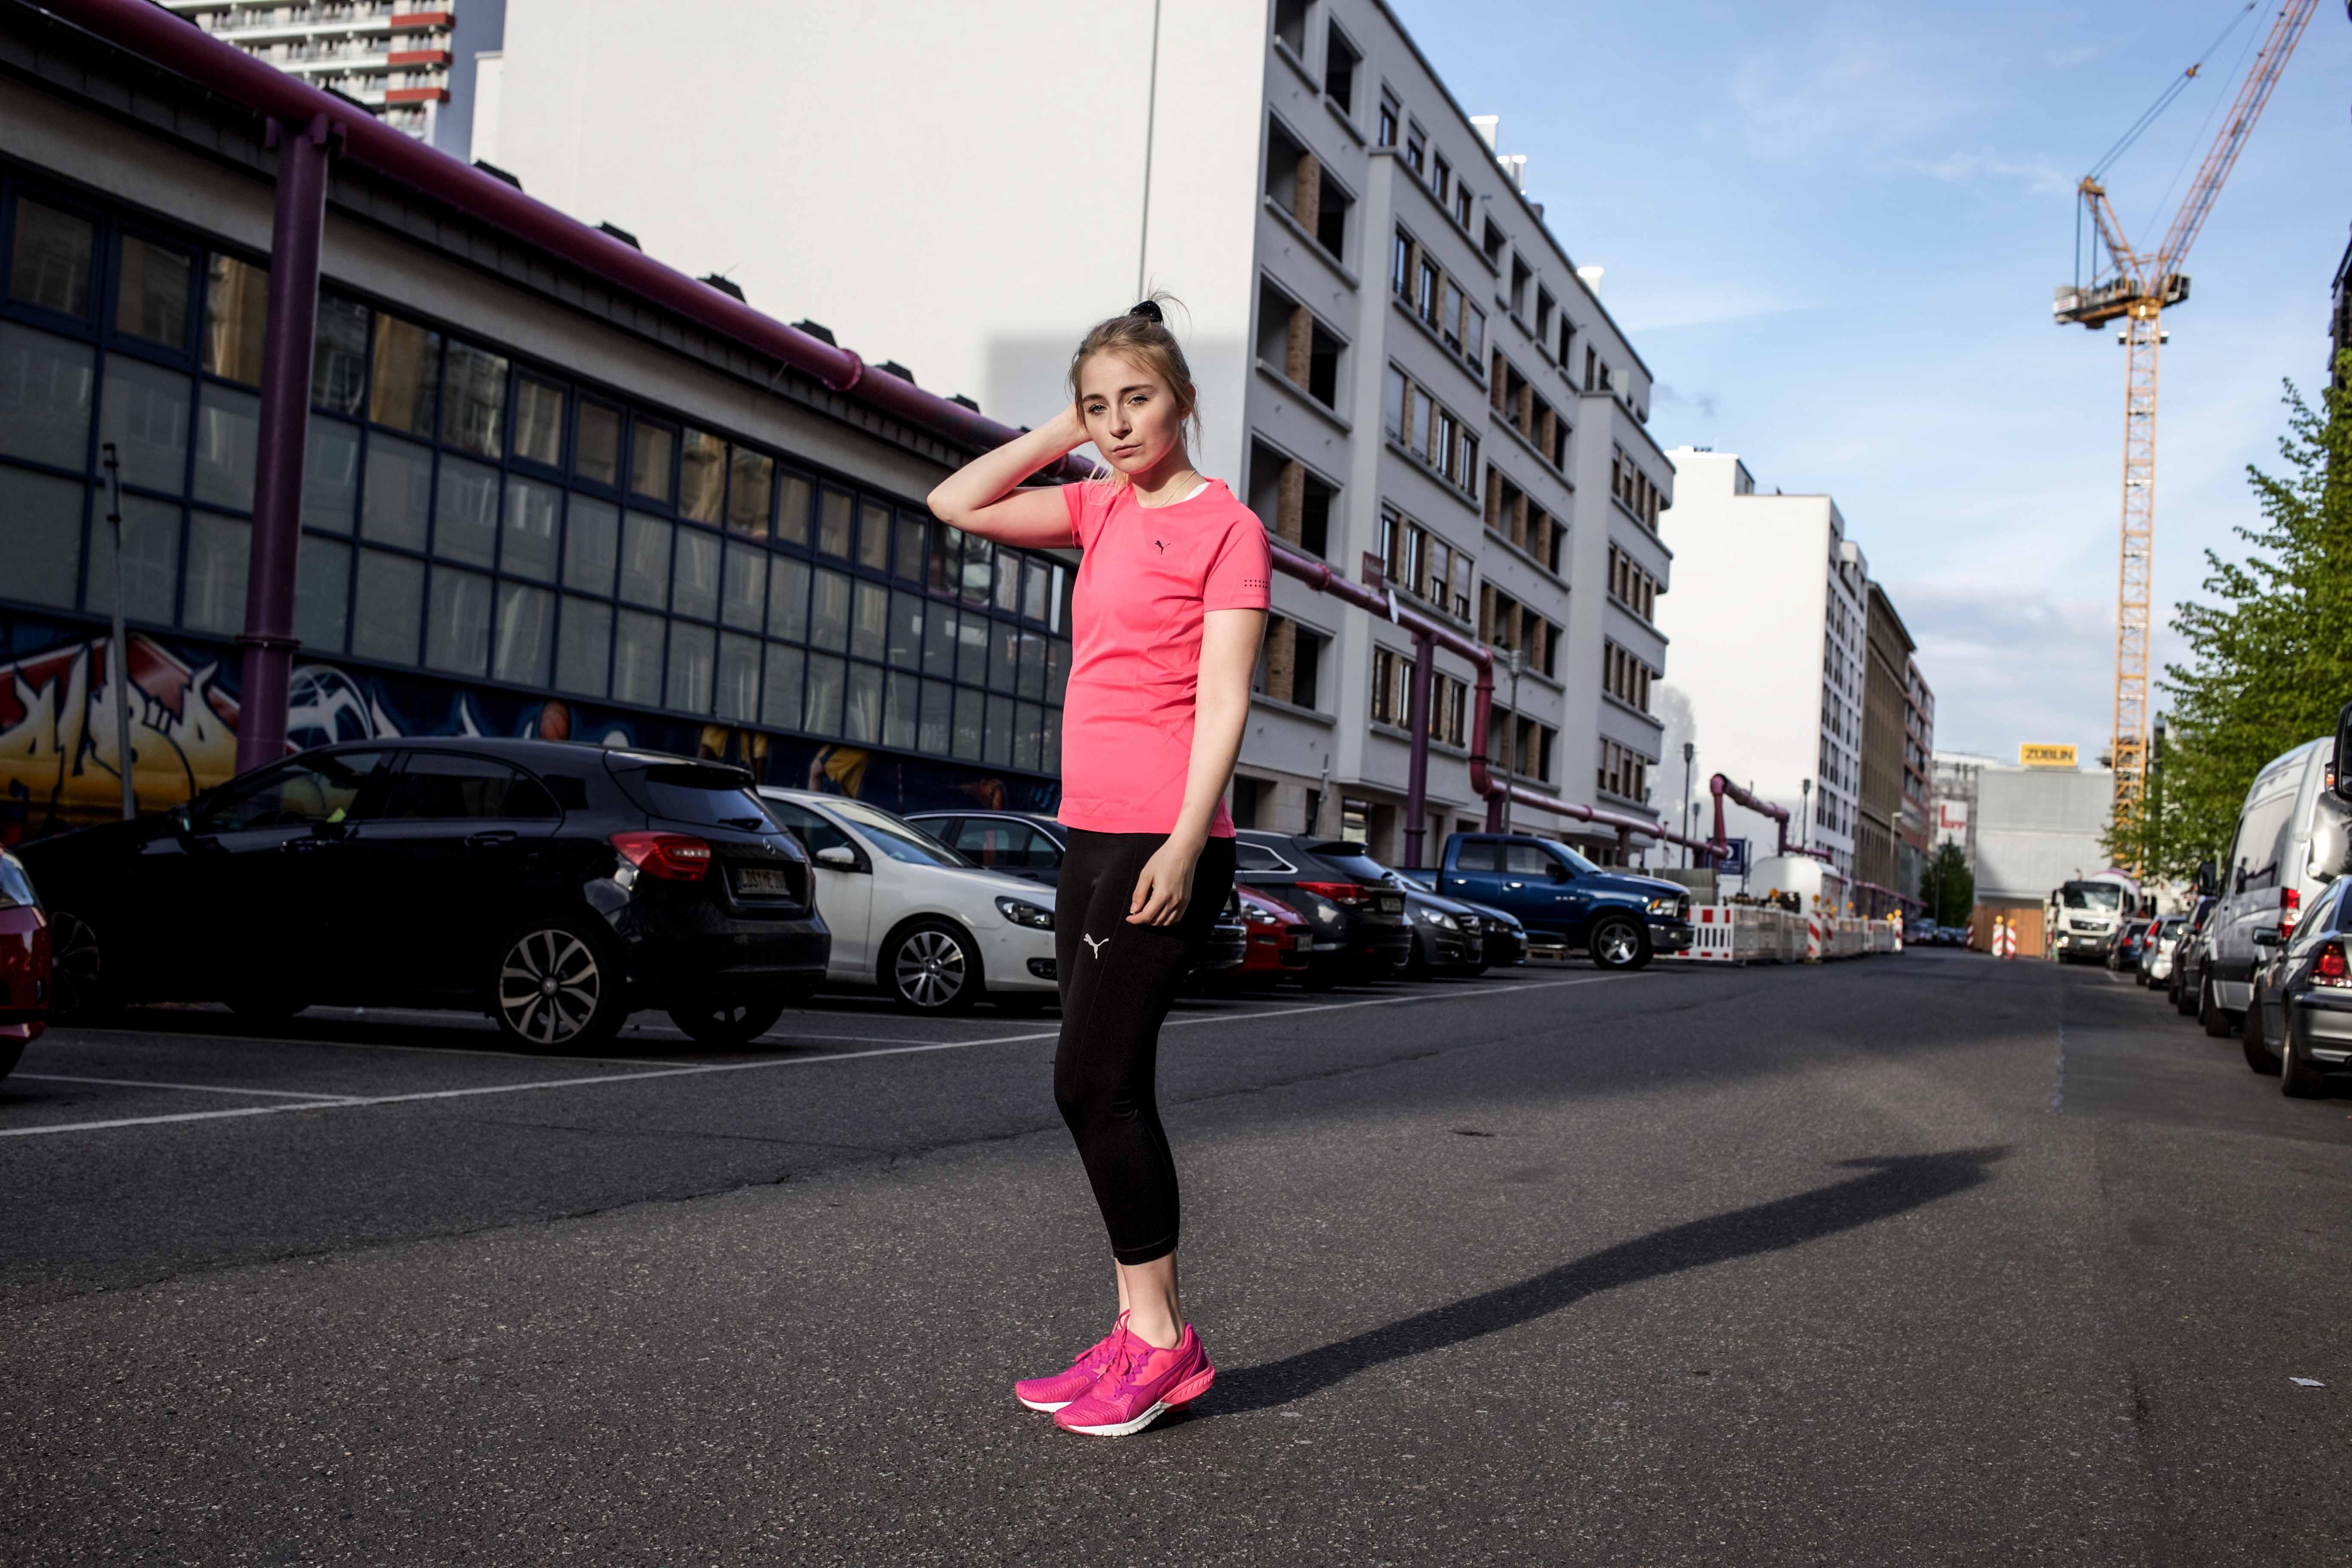 puma-lauf-outfit-laufen-tipps-joggen-mode-fitness-gym-workout-sport_8448